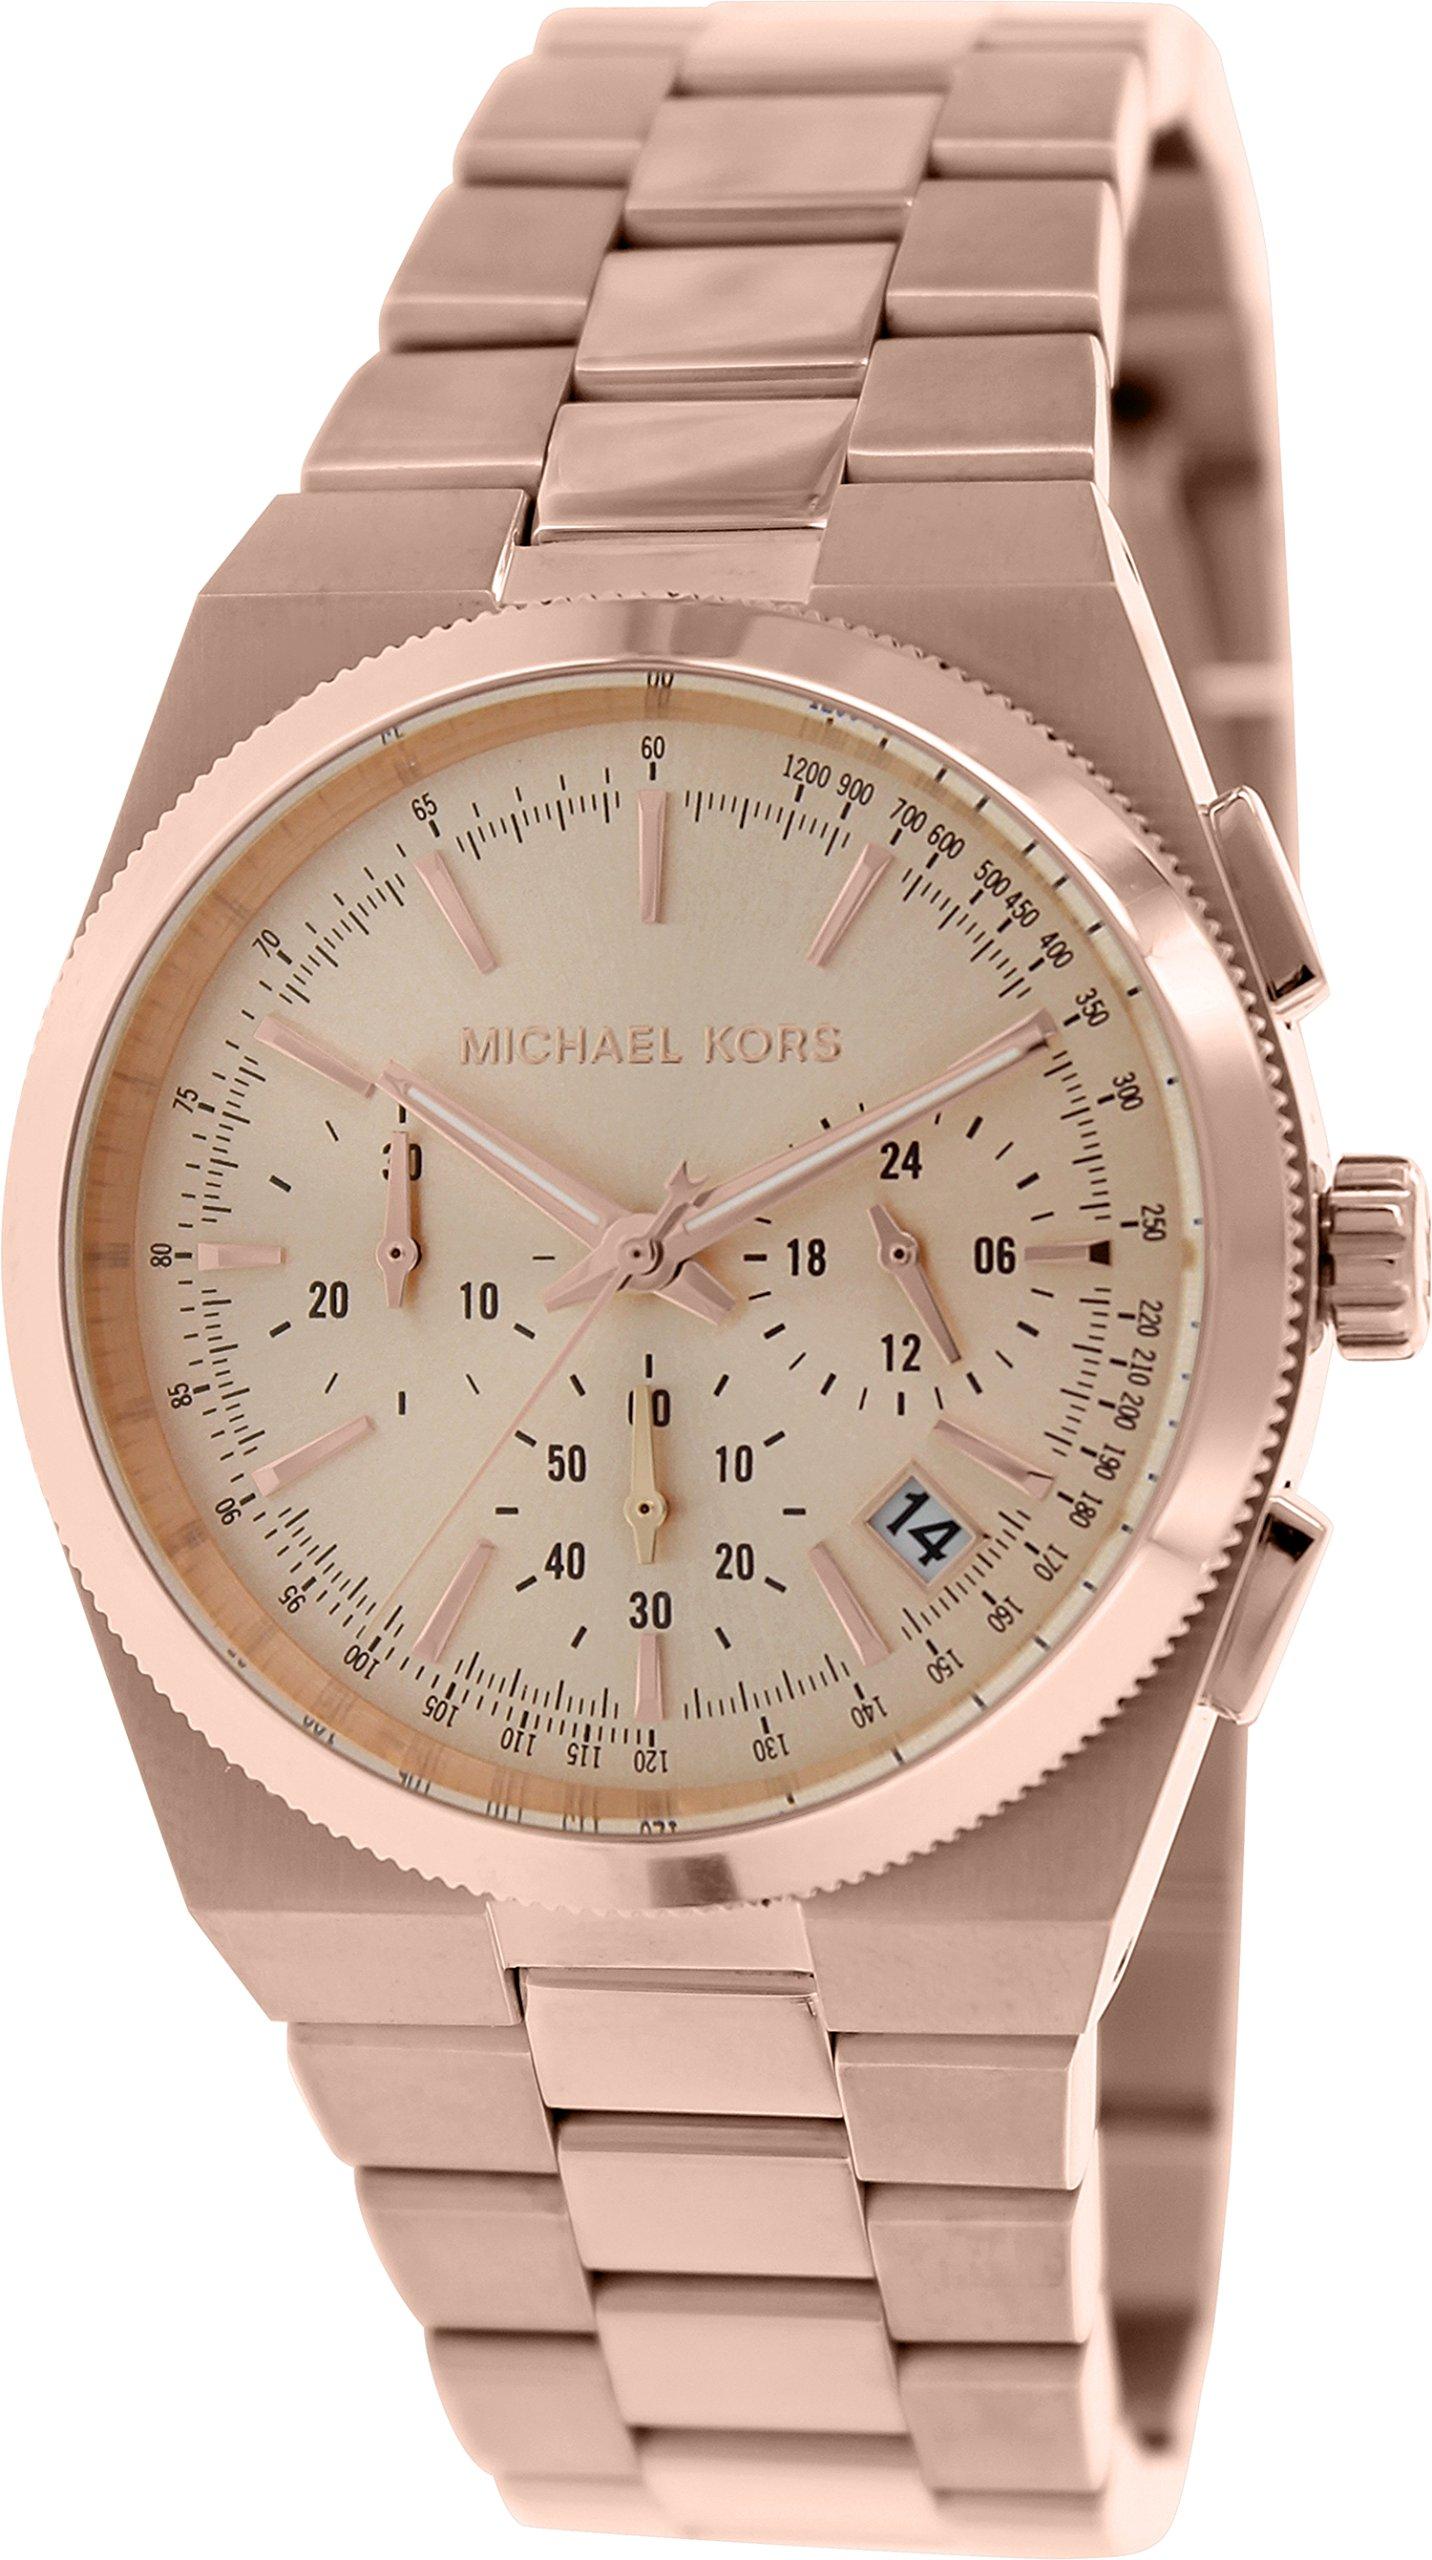 Đồng hồ Michael Kors Women's MK5927